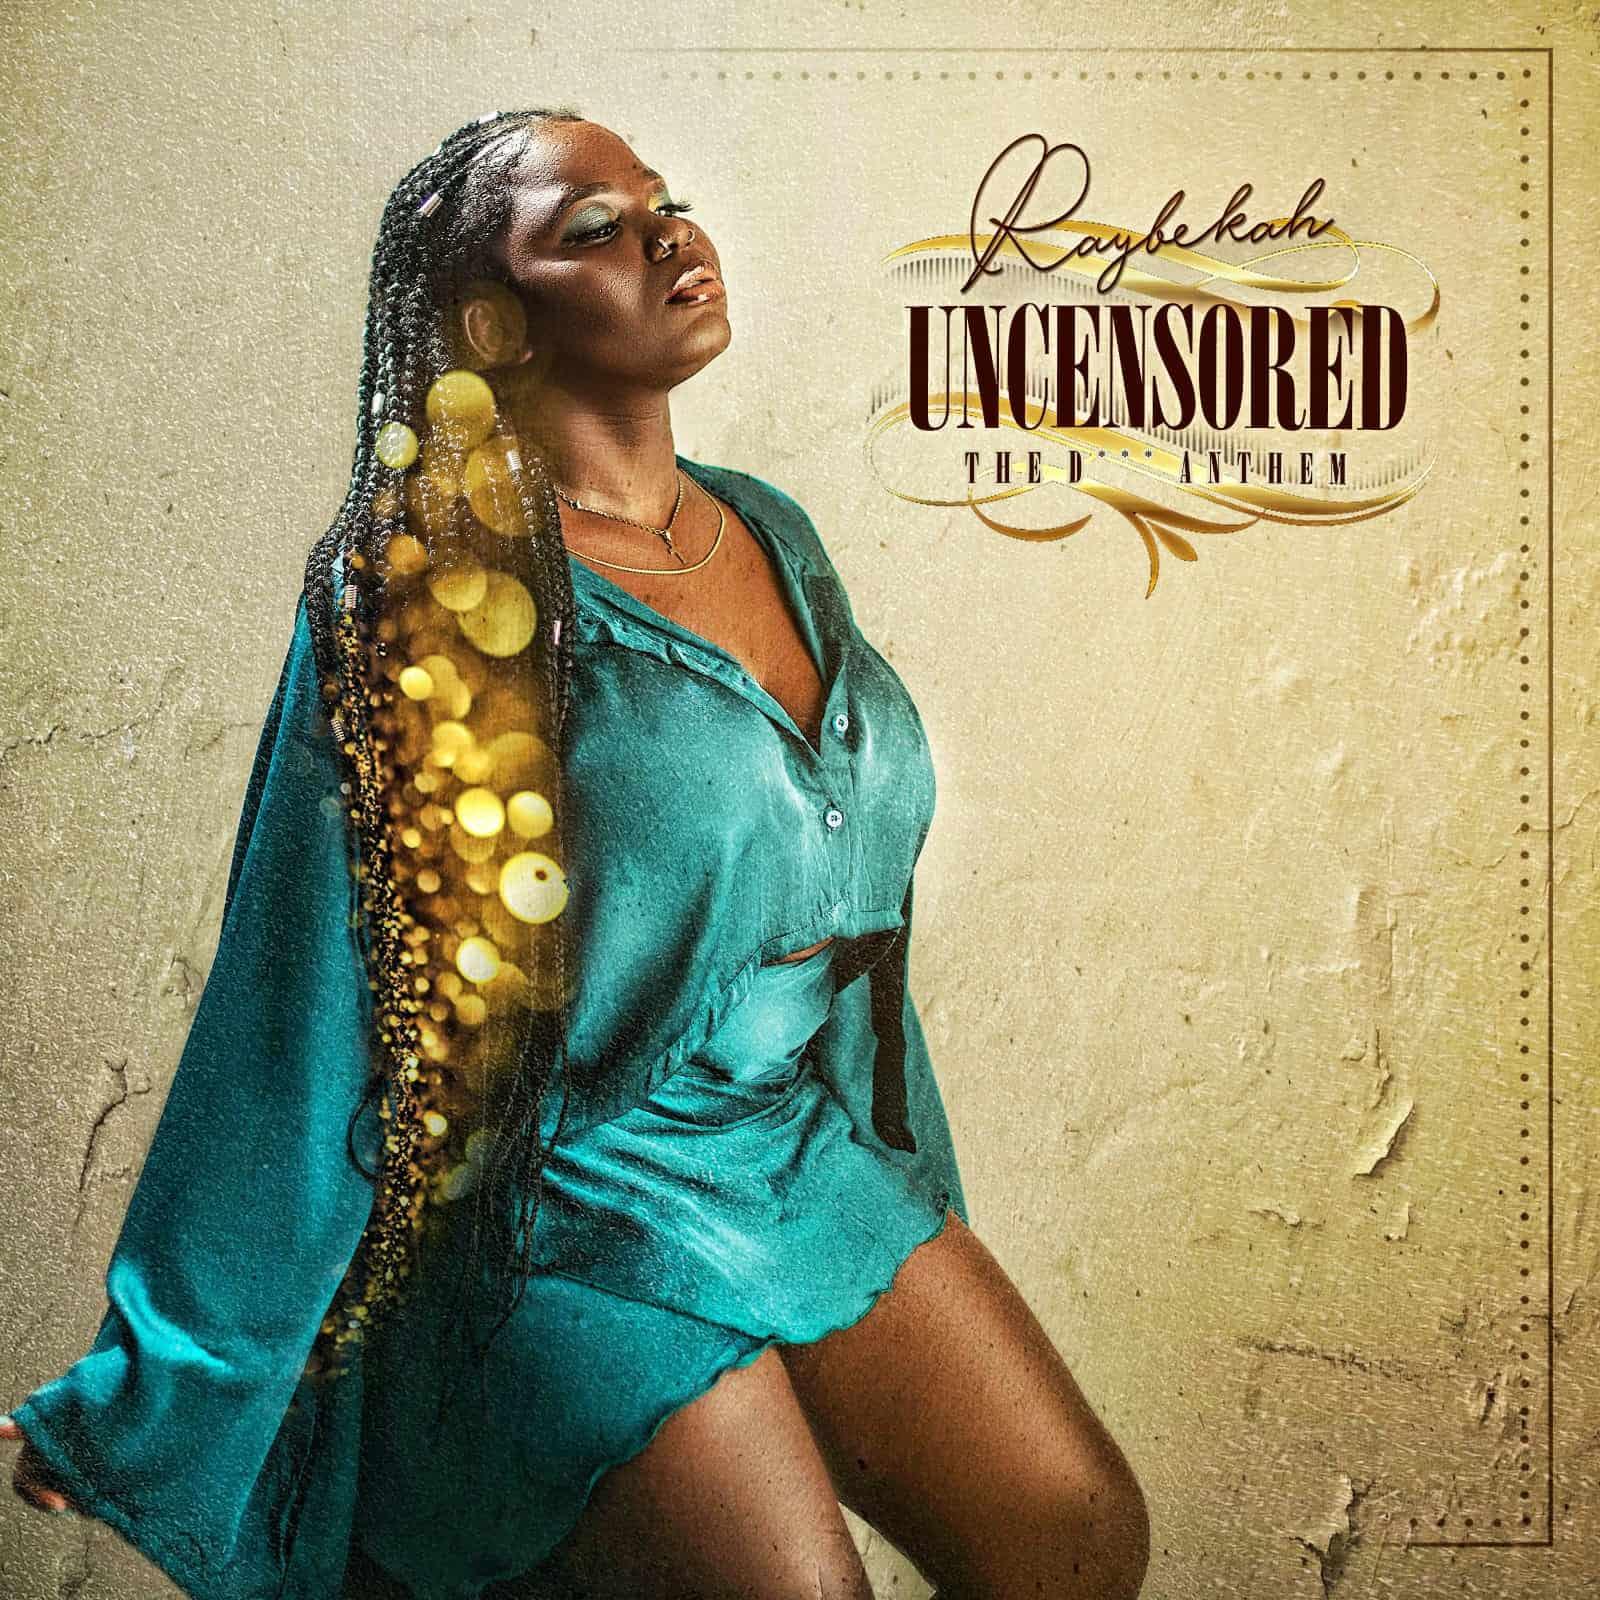 Raybekah - Uncensored (Dancehall)